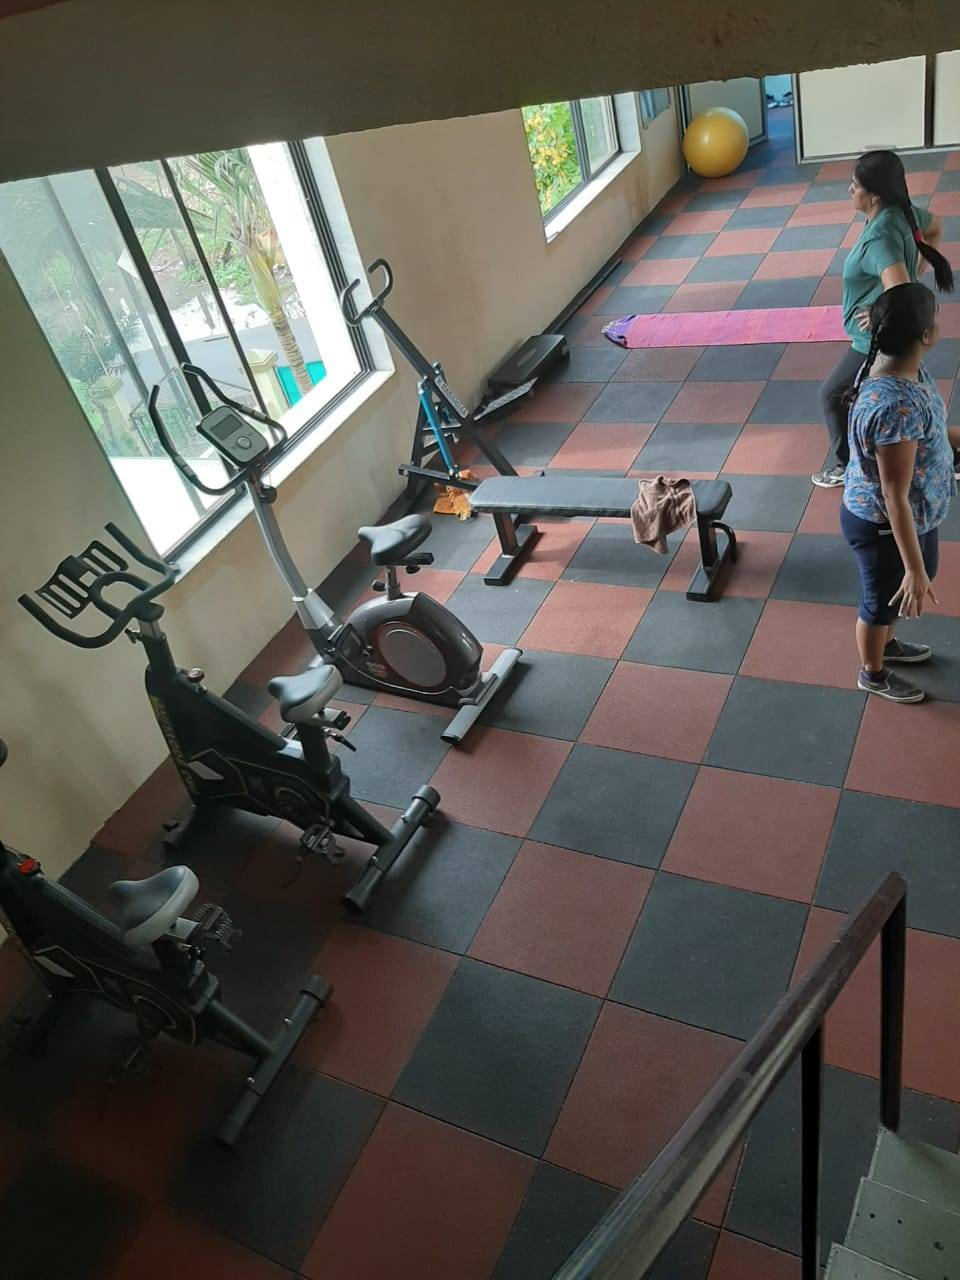 Valsad-Garib-Nawaz-Society-DFC-Decent-Fitness-Centre_384_Mzg0